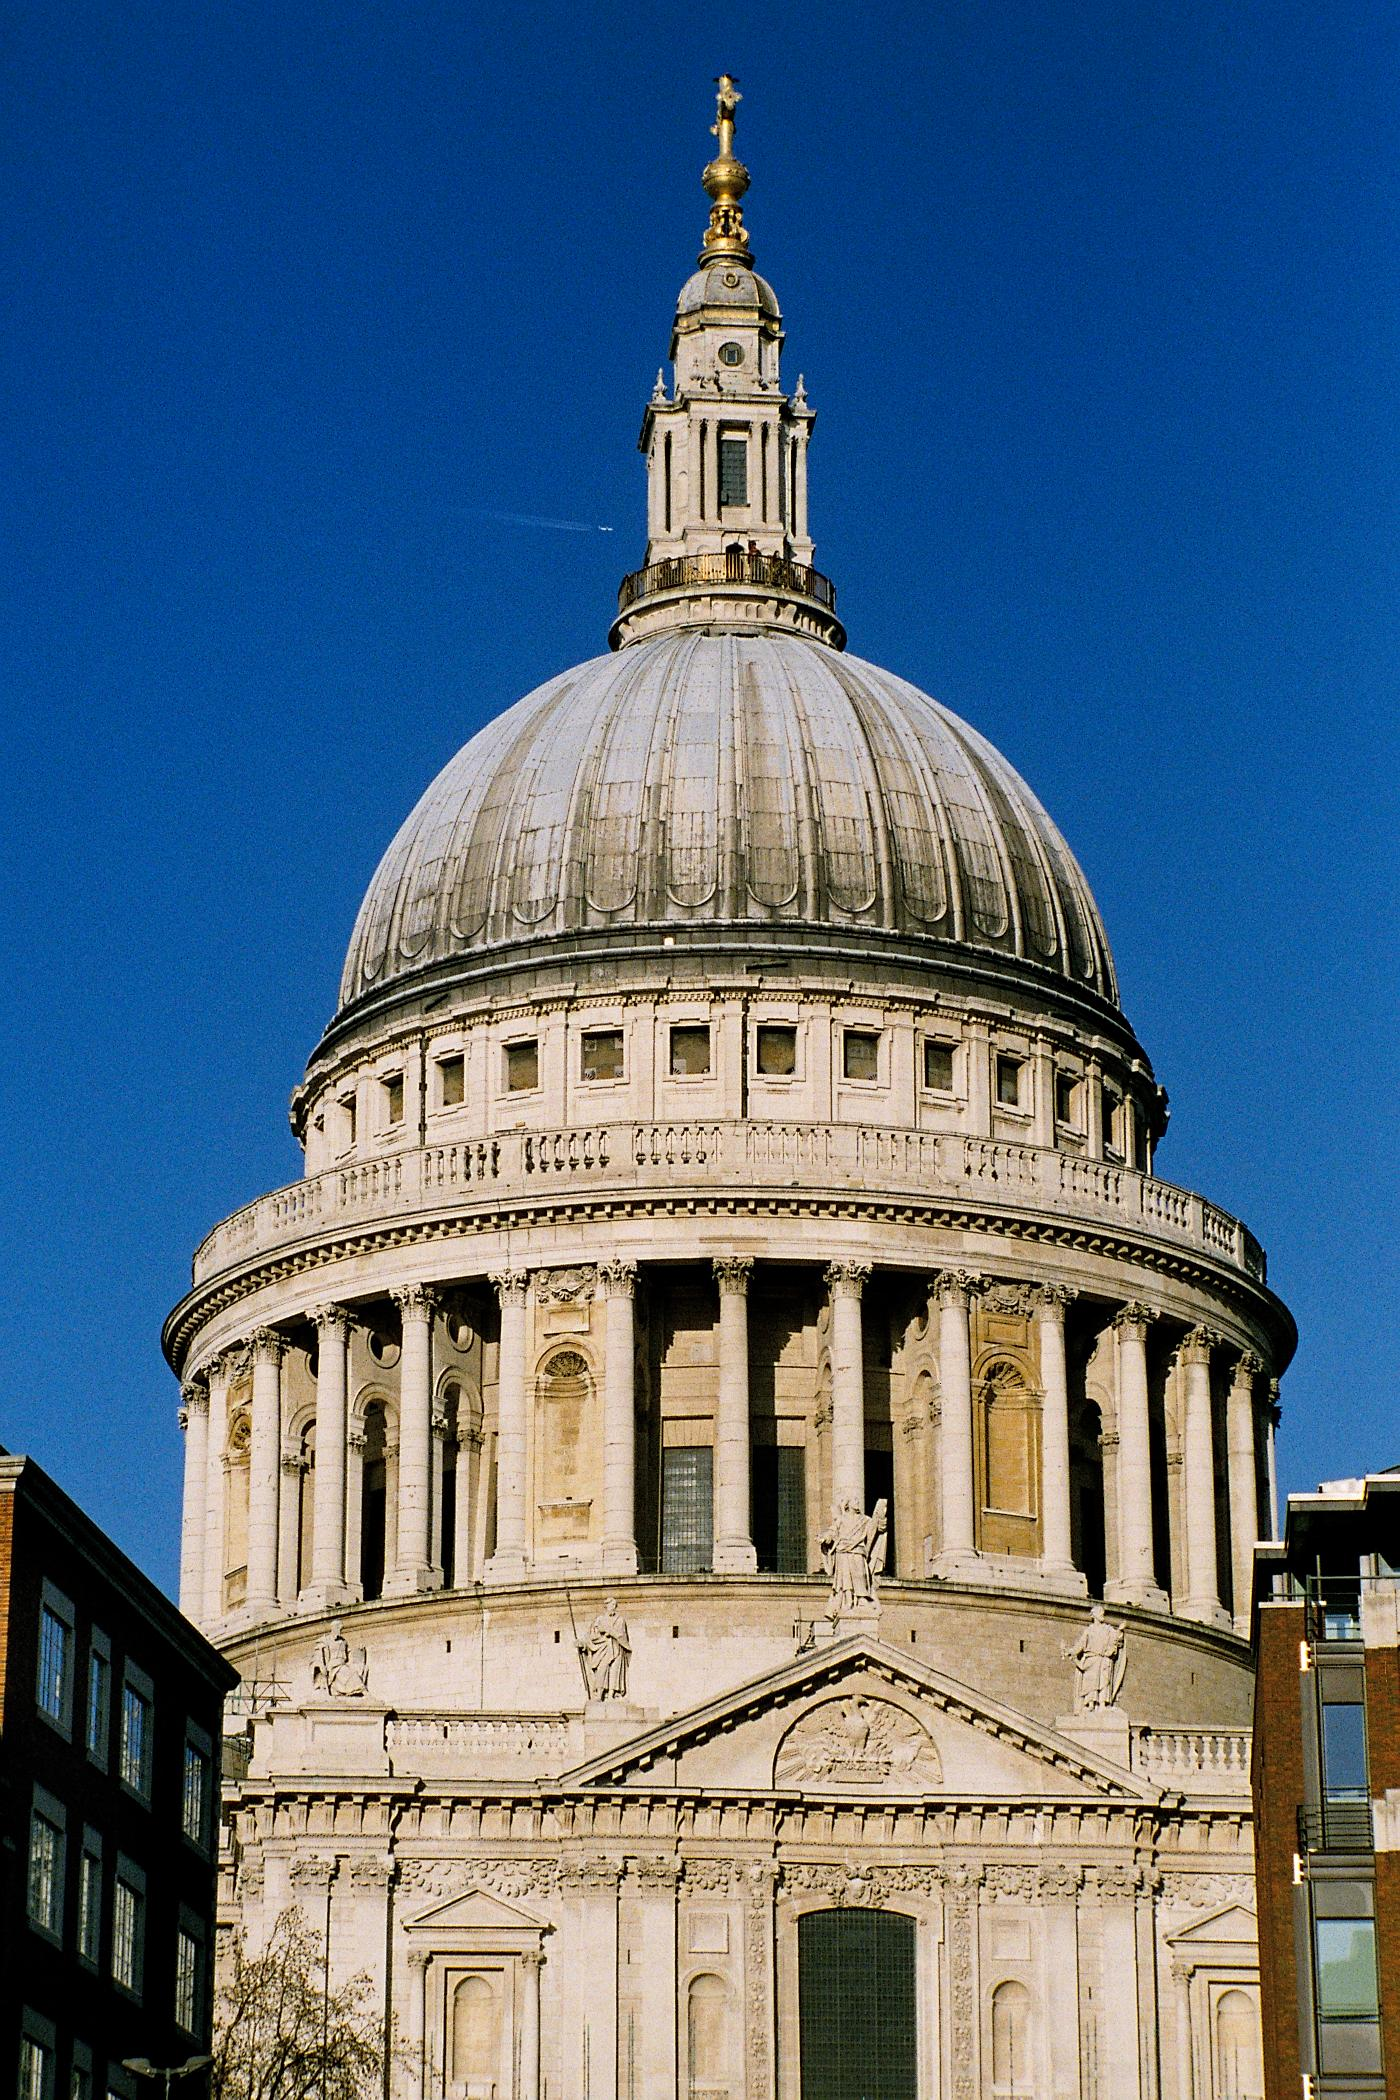 File:St Paul dome.jpeg - Wikimedia Commons